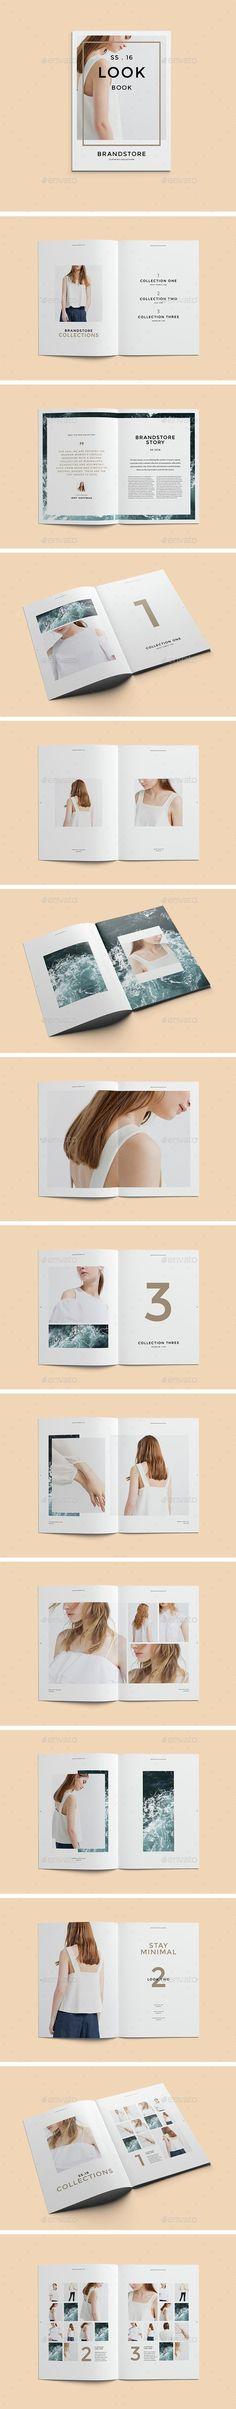 Fashion portfolio book layout editorial design for 2019 Portfolio Design, Mode Portfolio Layout, Fashion Portfolio Layout, Portfolio Booklet, Magazine Layout Design, Book Design Layout, Print Layout, Design Layouts, Book Layouts